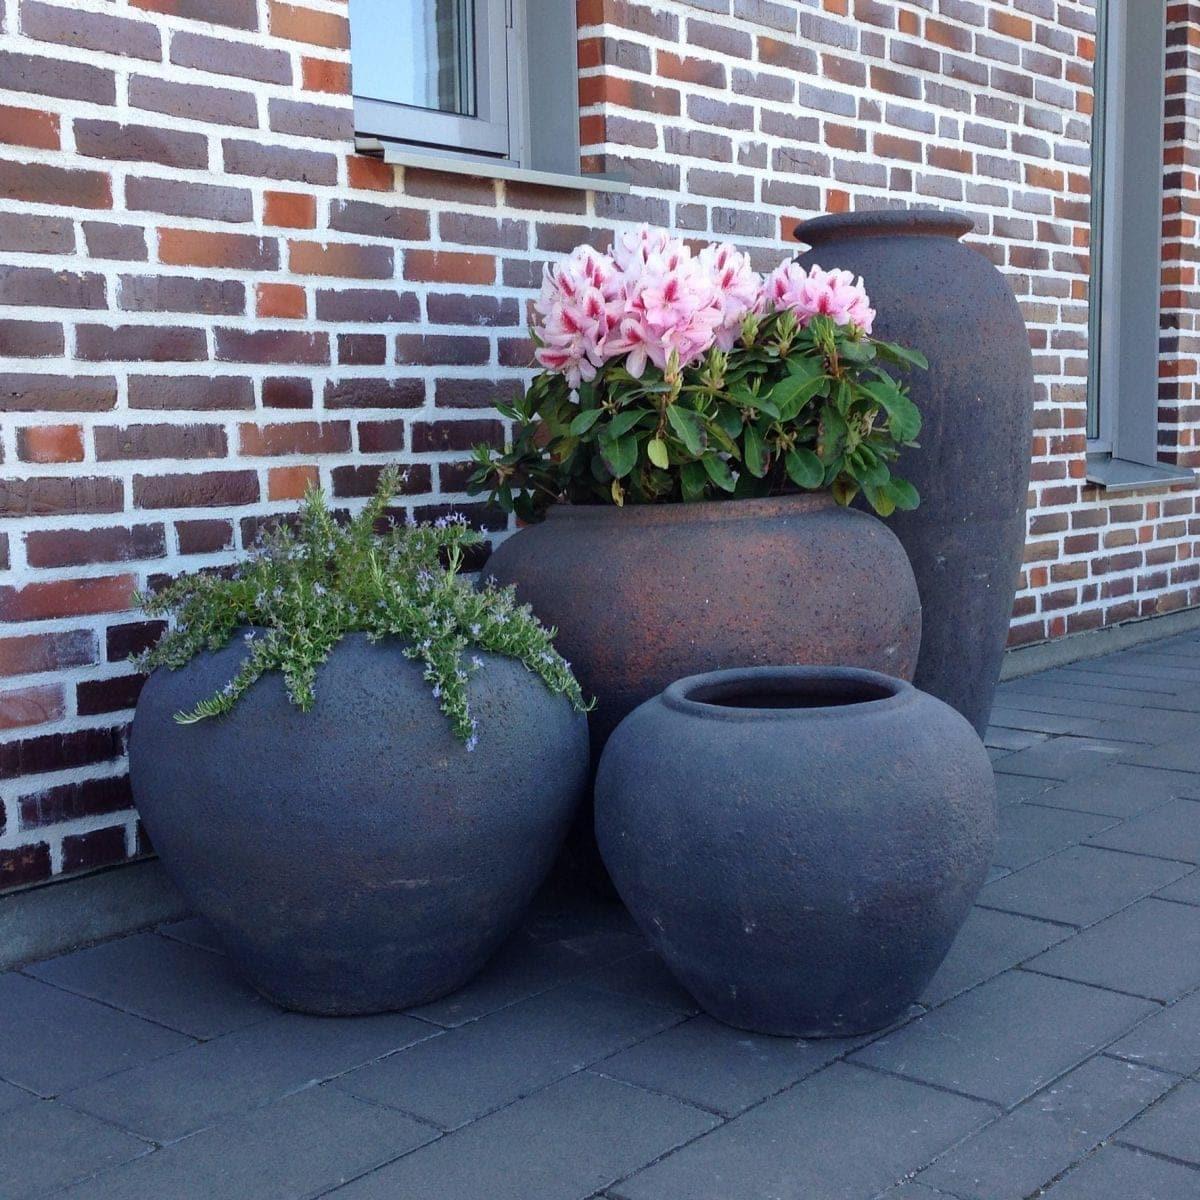 Vaso Vecchio stora låga urnor interiordesign och gardendesign (2)